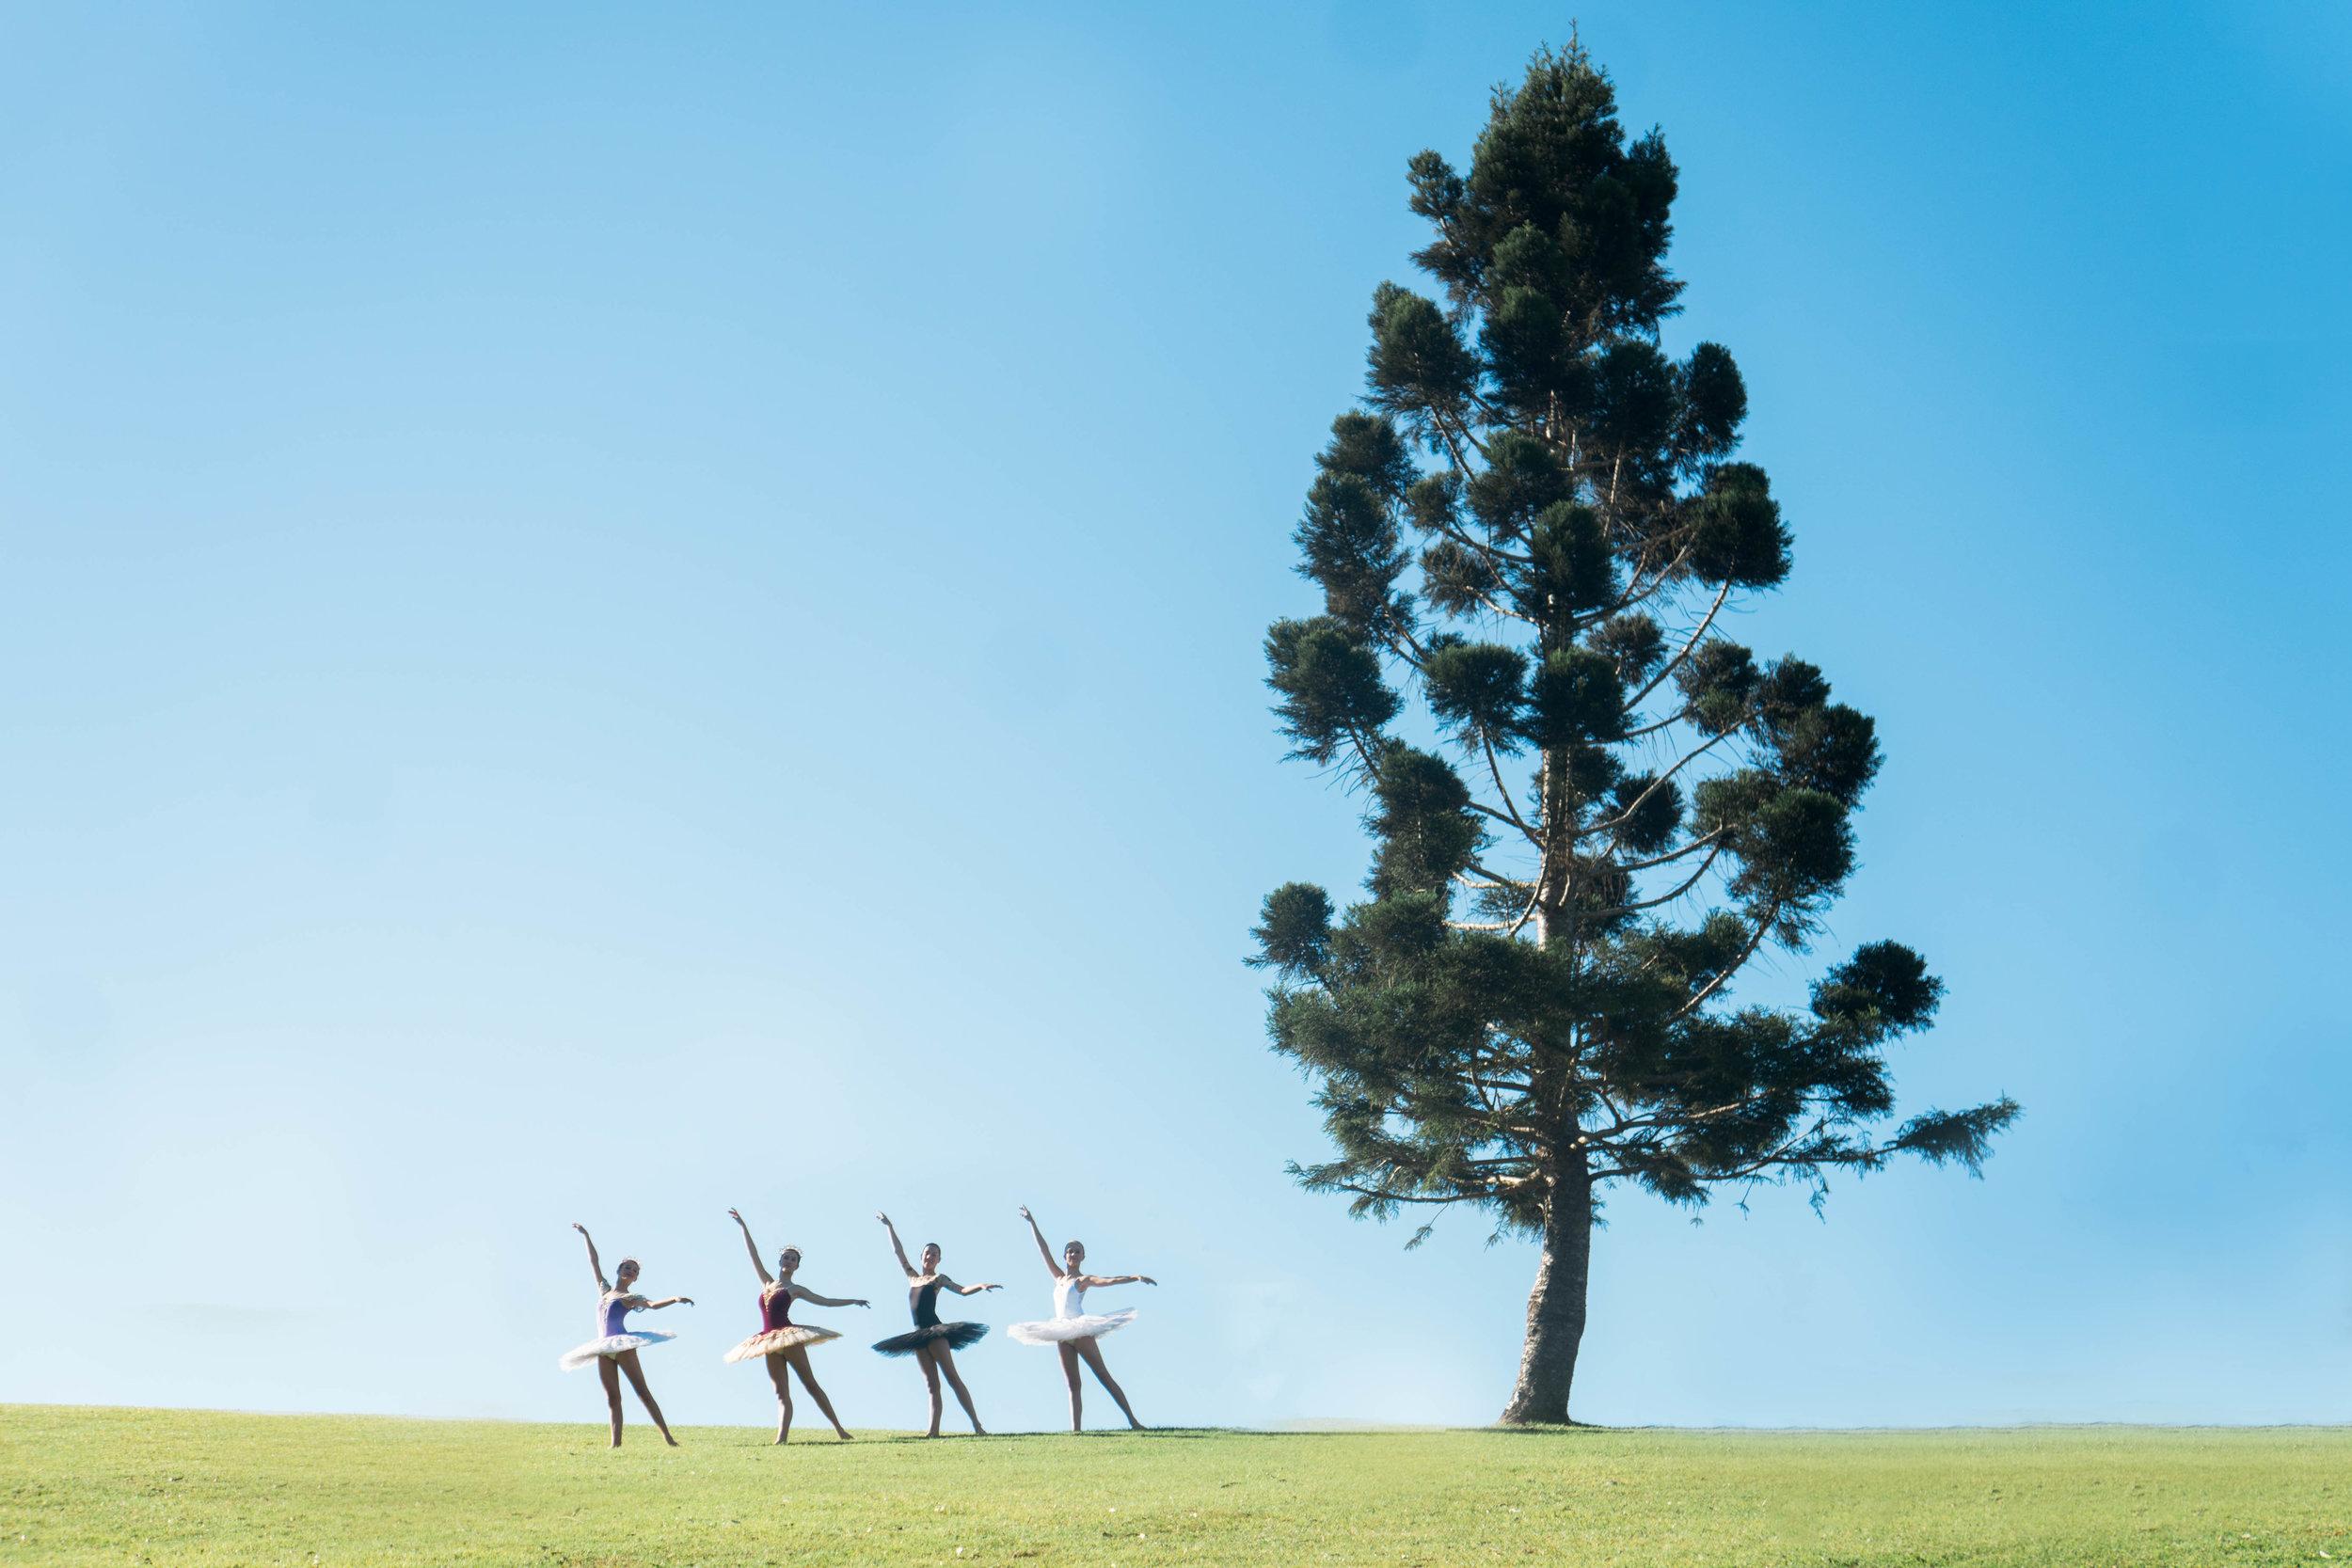 Hinterland-Dance-20.08.17-27.jpg